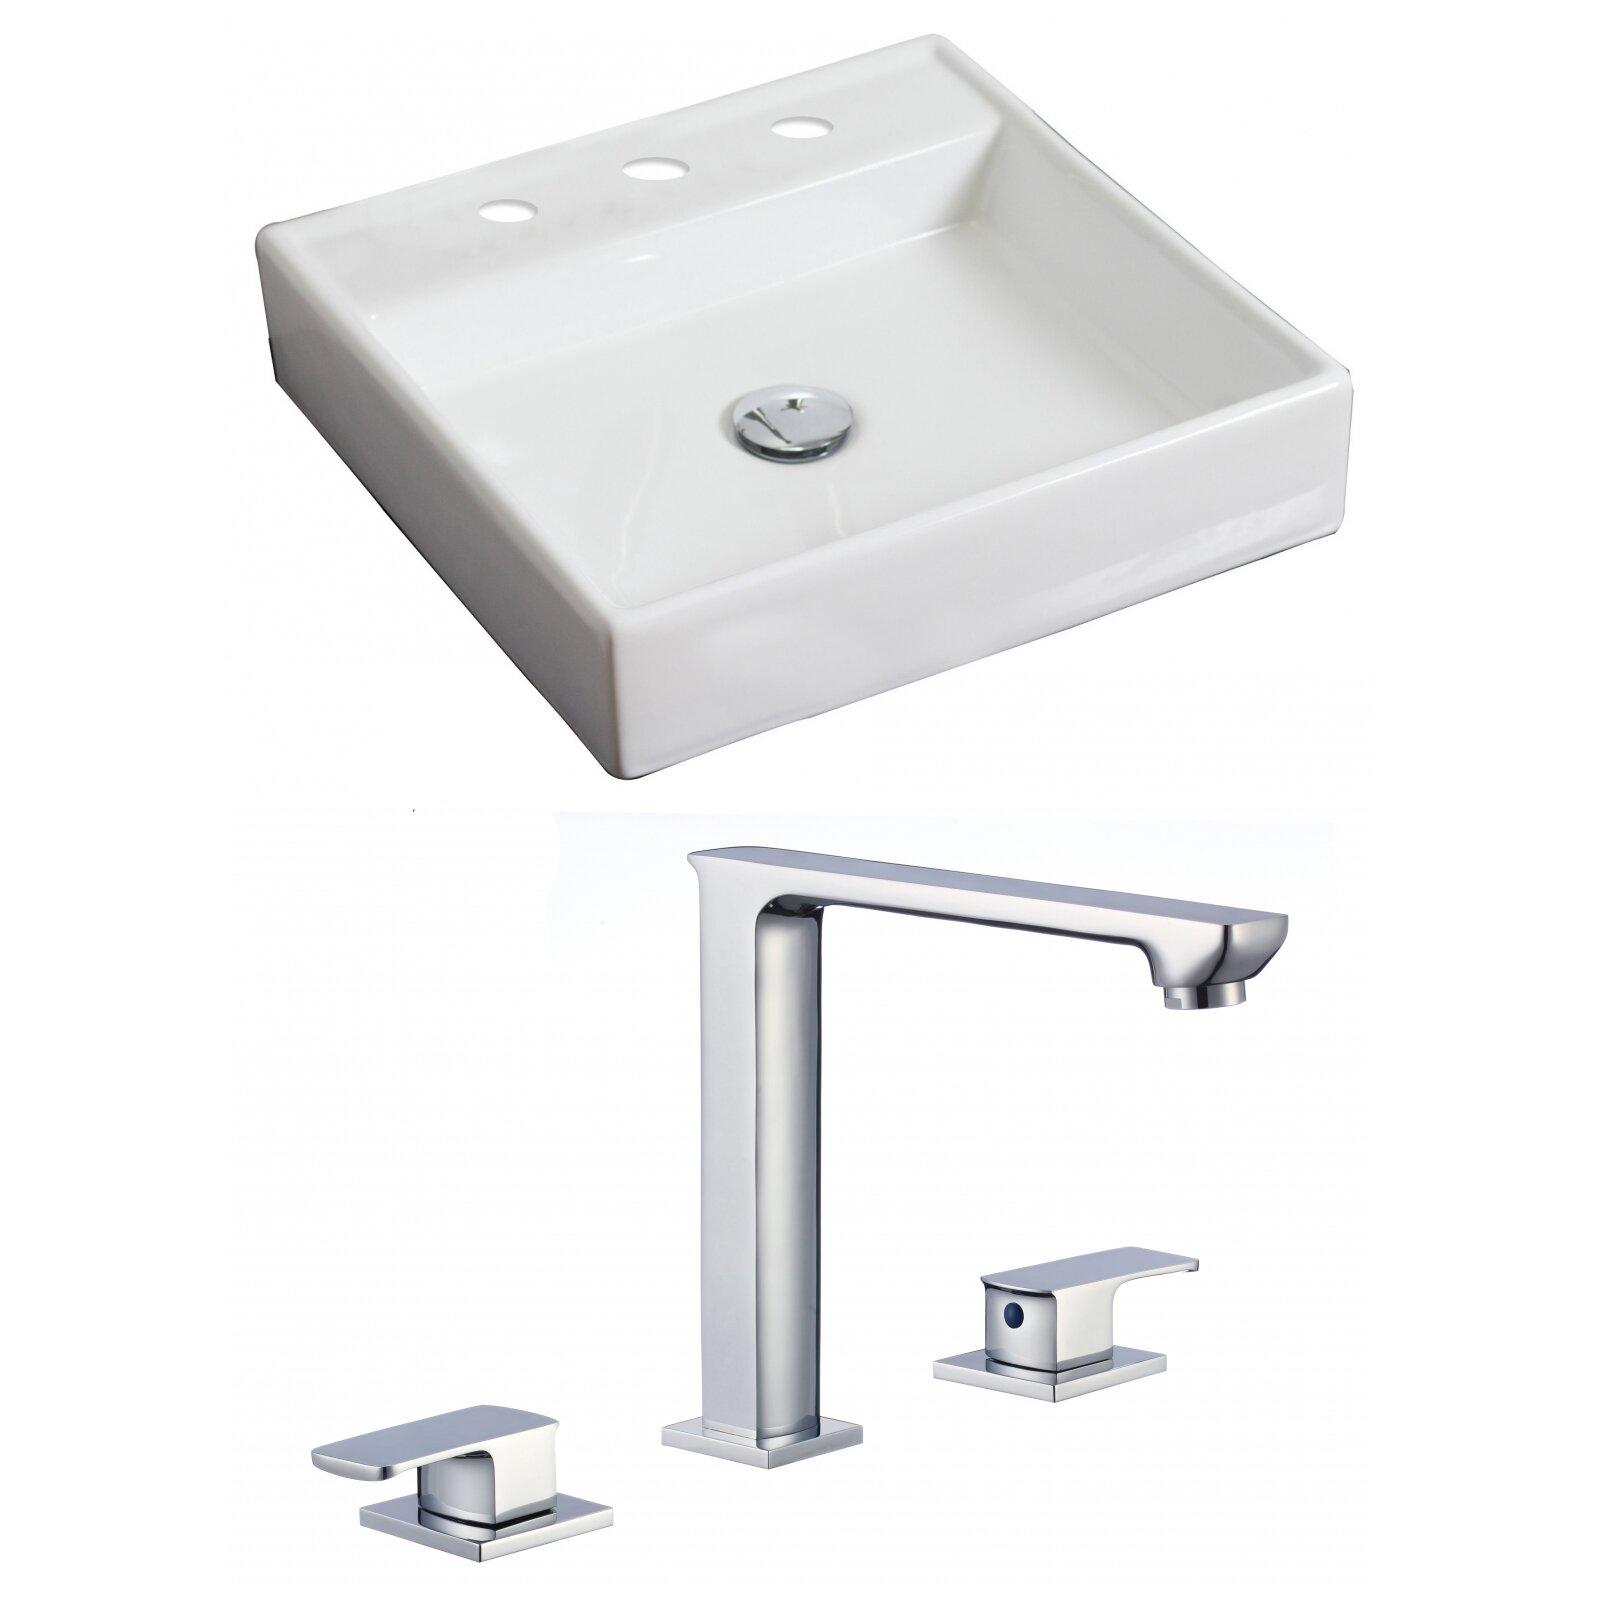 Square Vessel Bathroom Sink : American Imaginations Square Vessel Bathroom Sink with Overflow ...